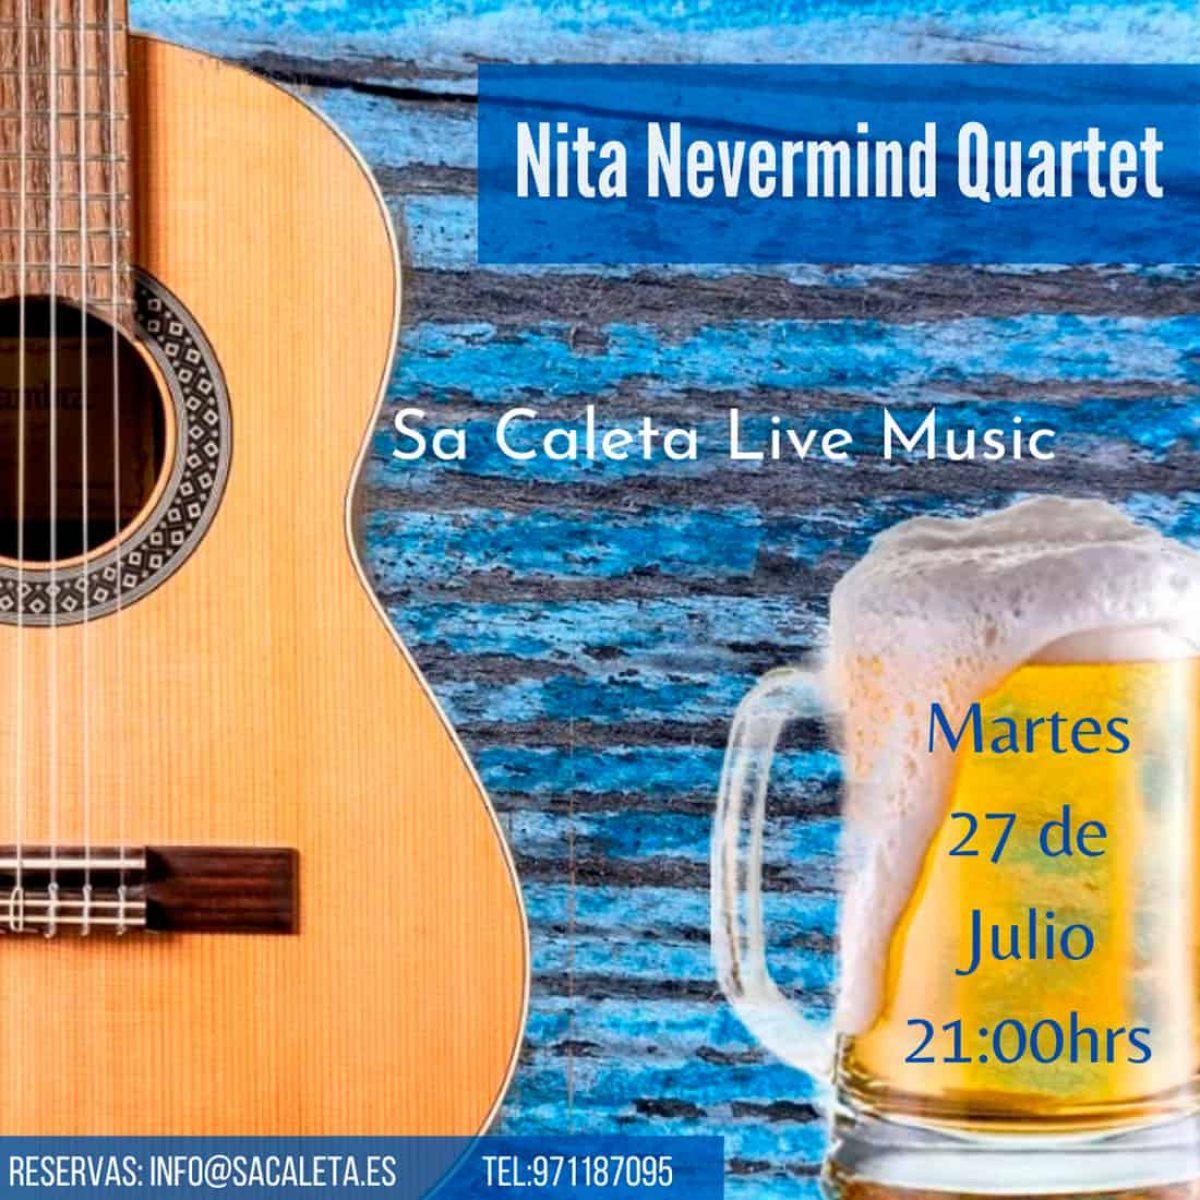 sa-caleta-live-music-astarte-el-jardin-sa-caleta-ibiza-nita-nevermind-quartet-2021-welcometoibiza